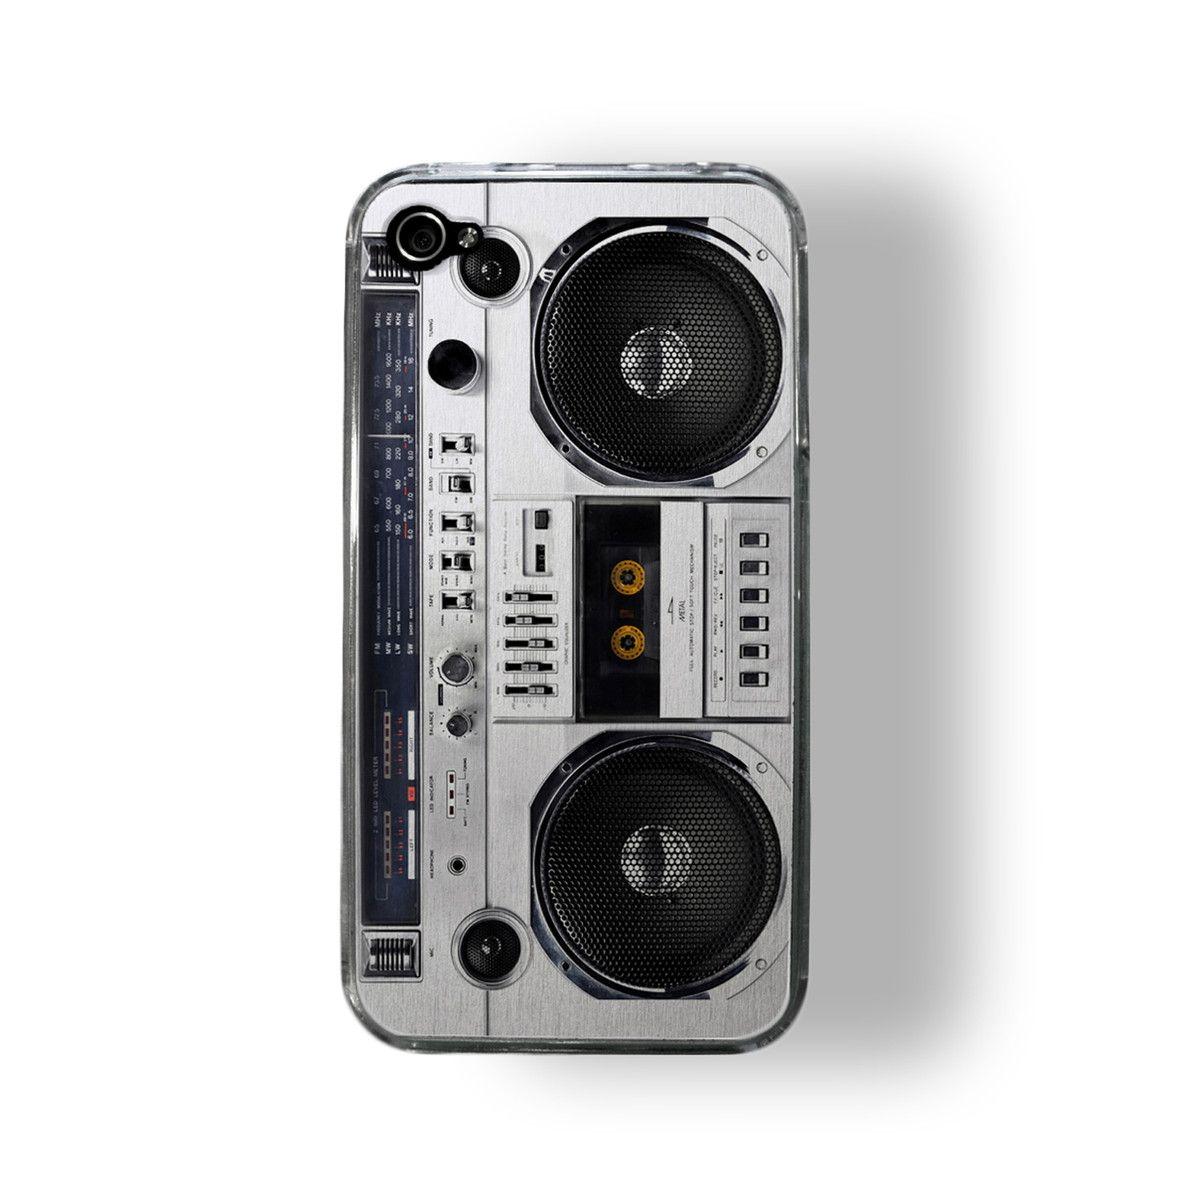 Boombox iPhone 4/4S Case